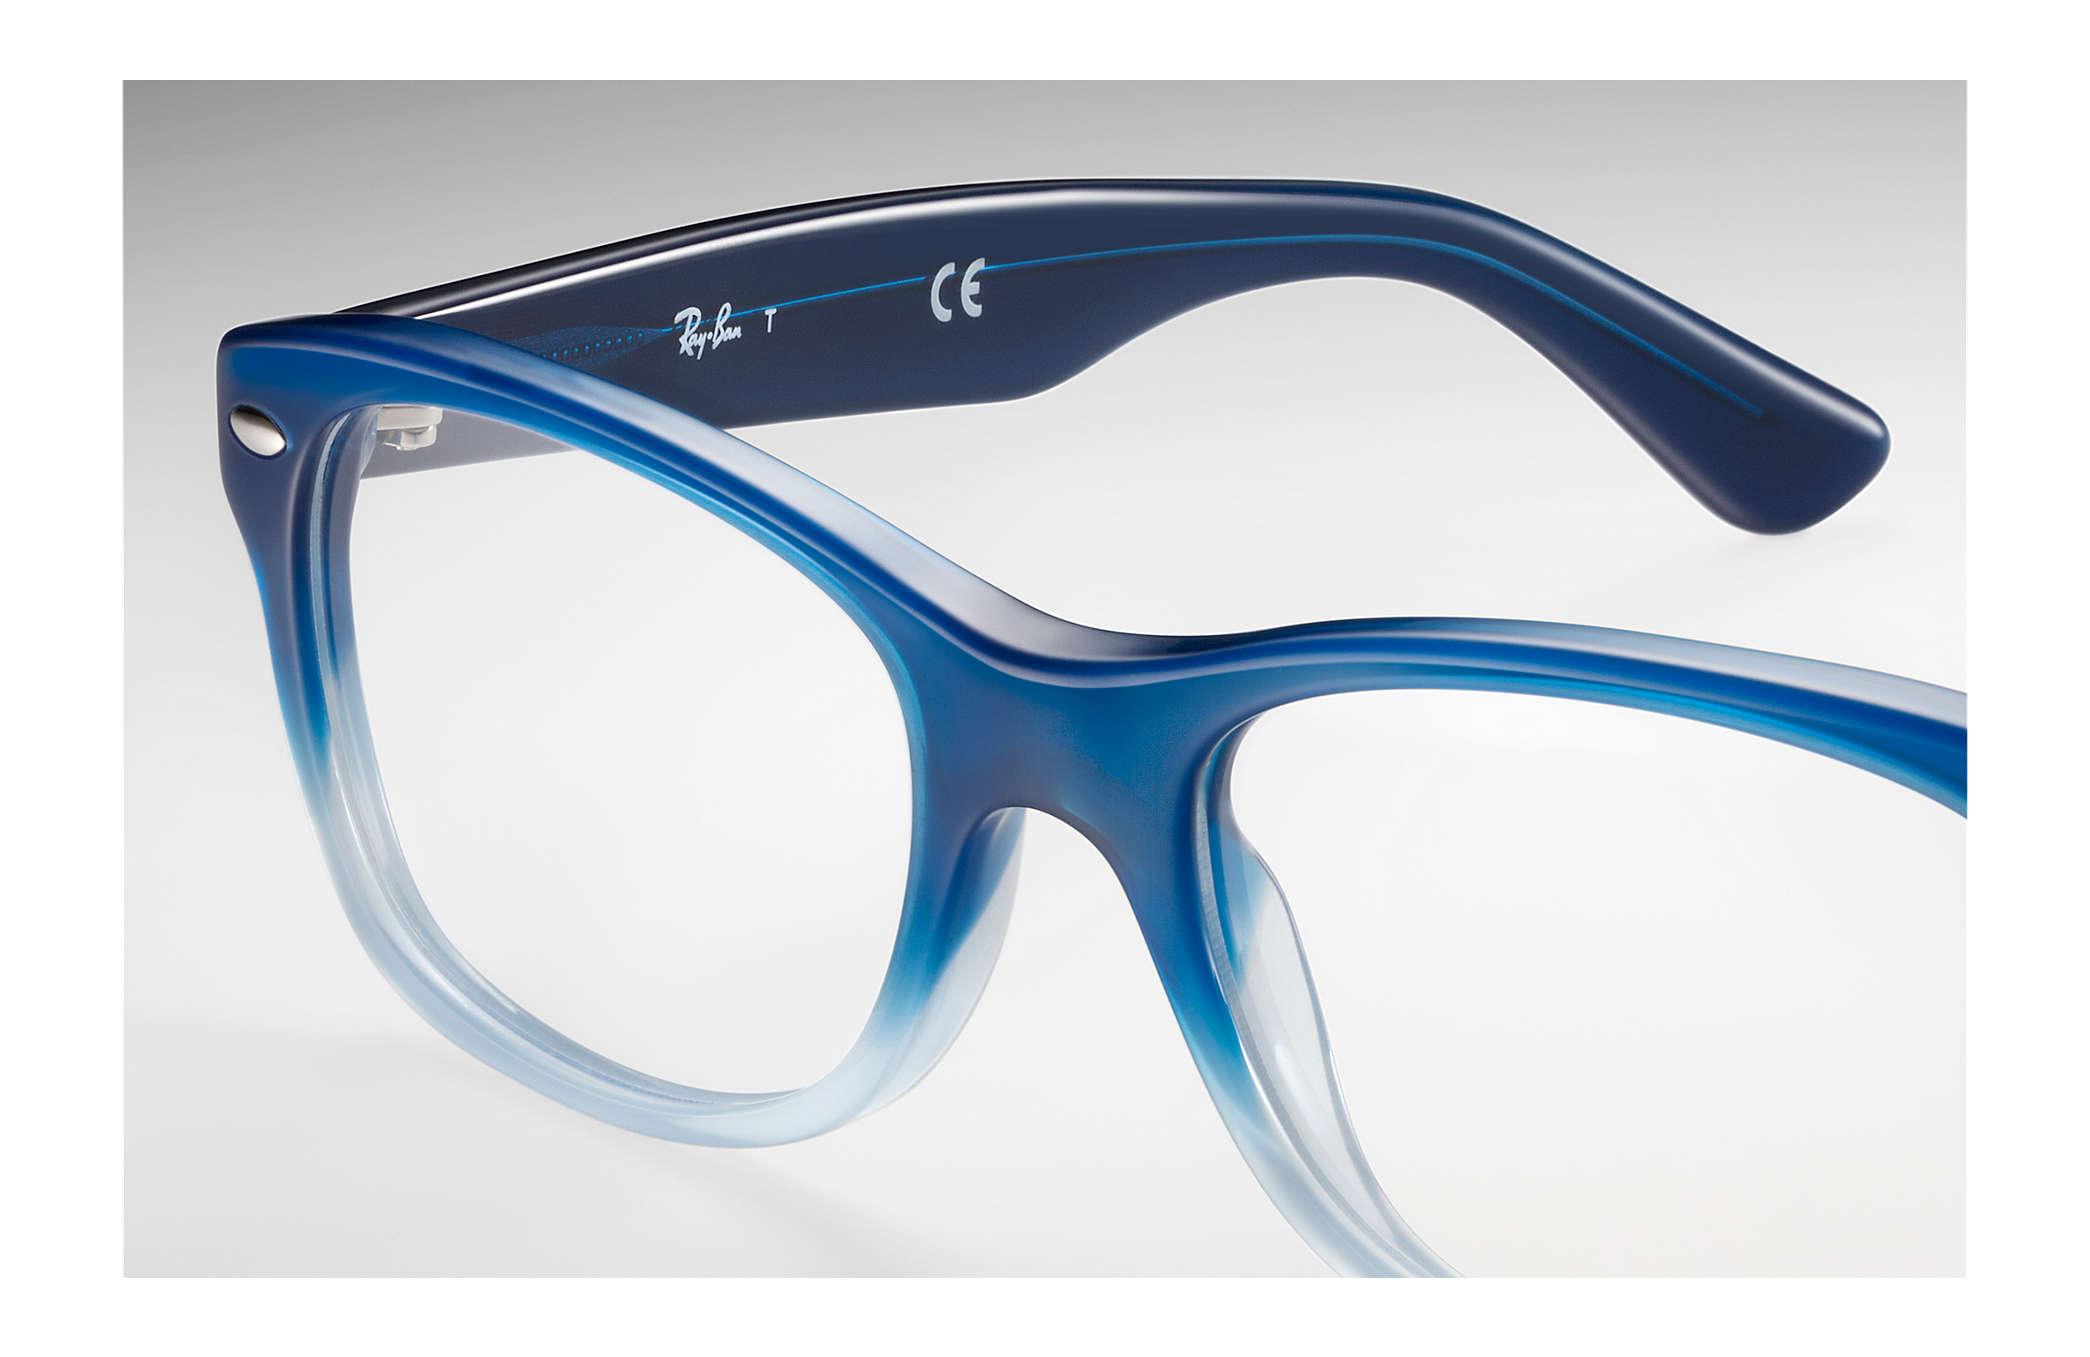 34f39278692 Ray-Ban prescription glasses RY1528 Blue - Acetate - 0RY1528358148 ...